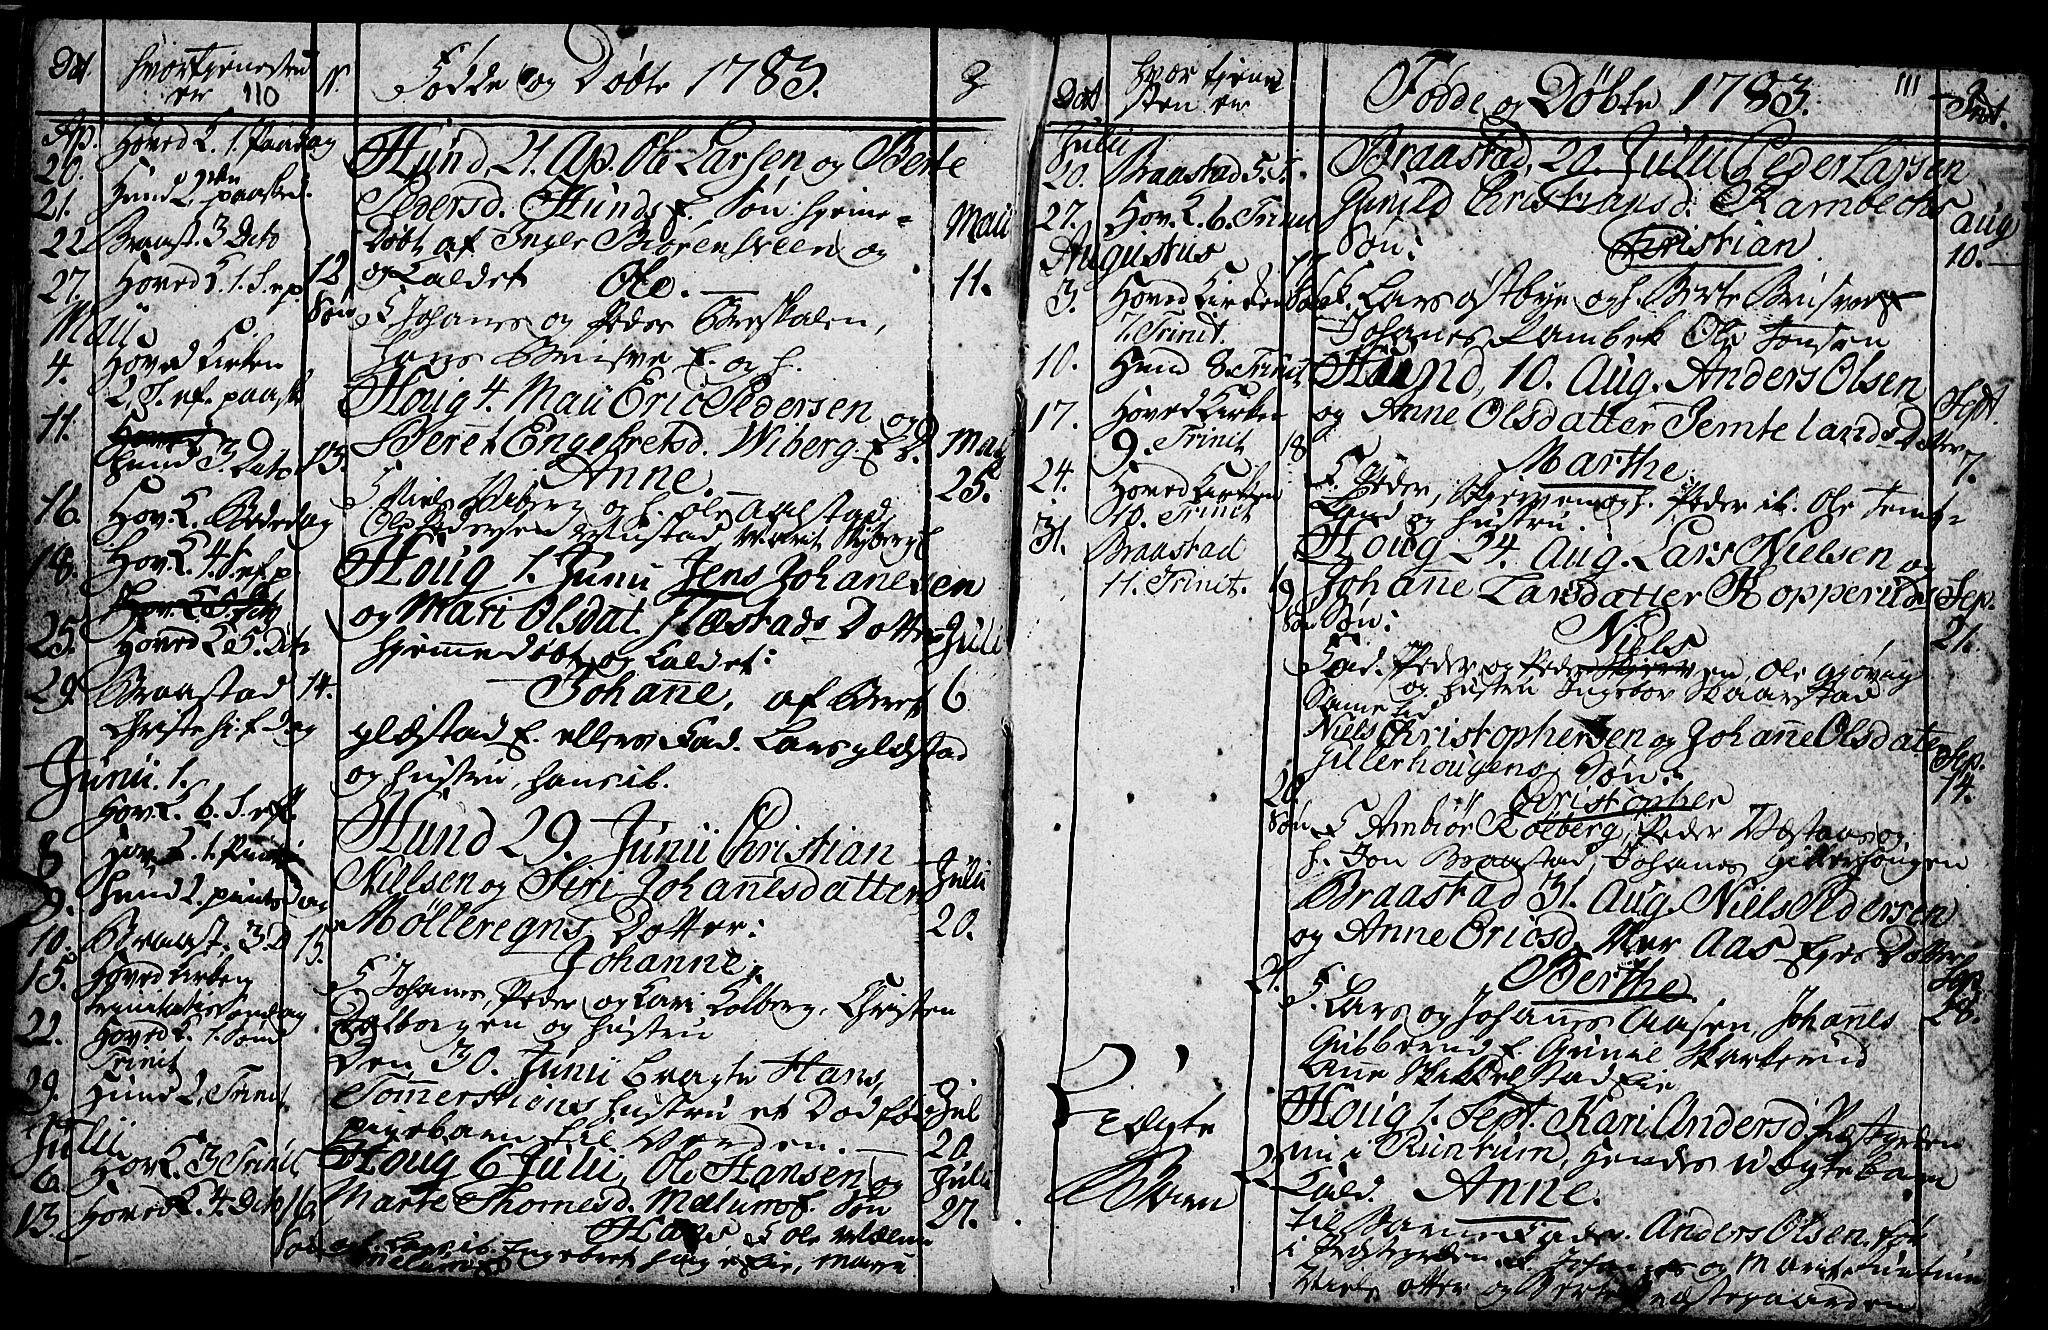 SAH, Vardal prestekontor, H/Ha/Hab/L0001: Klokkerbok nr. 1, 1771-1790, s. 110-111